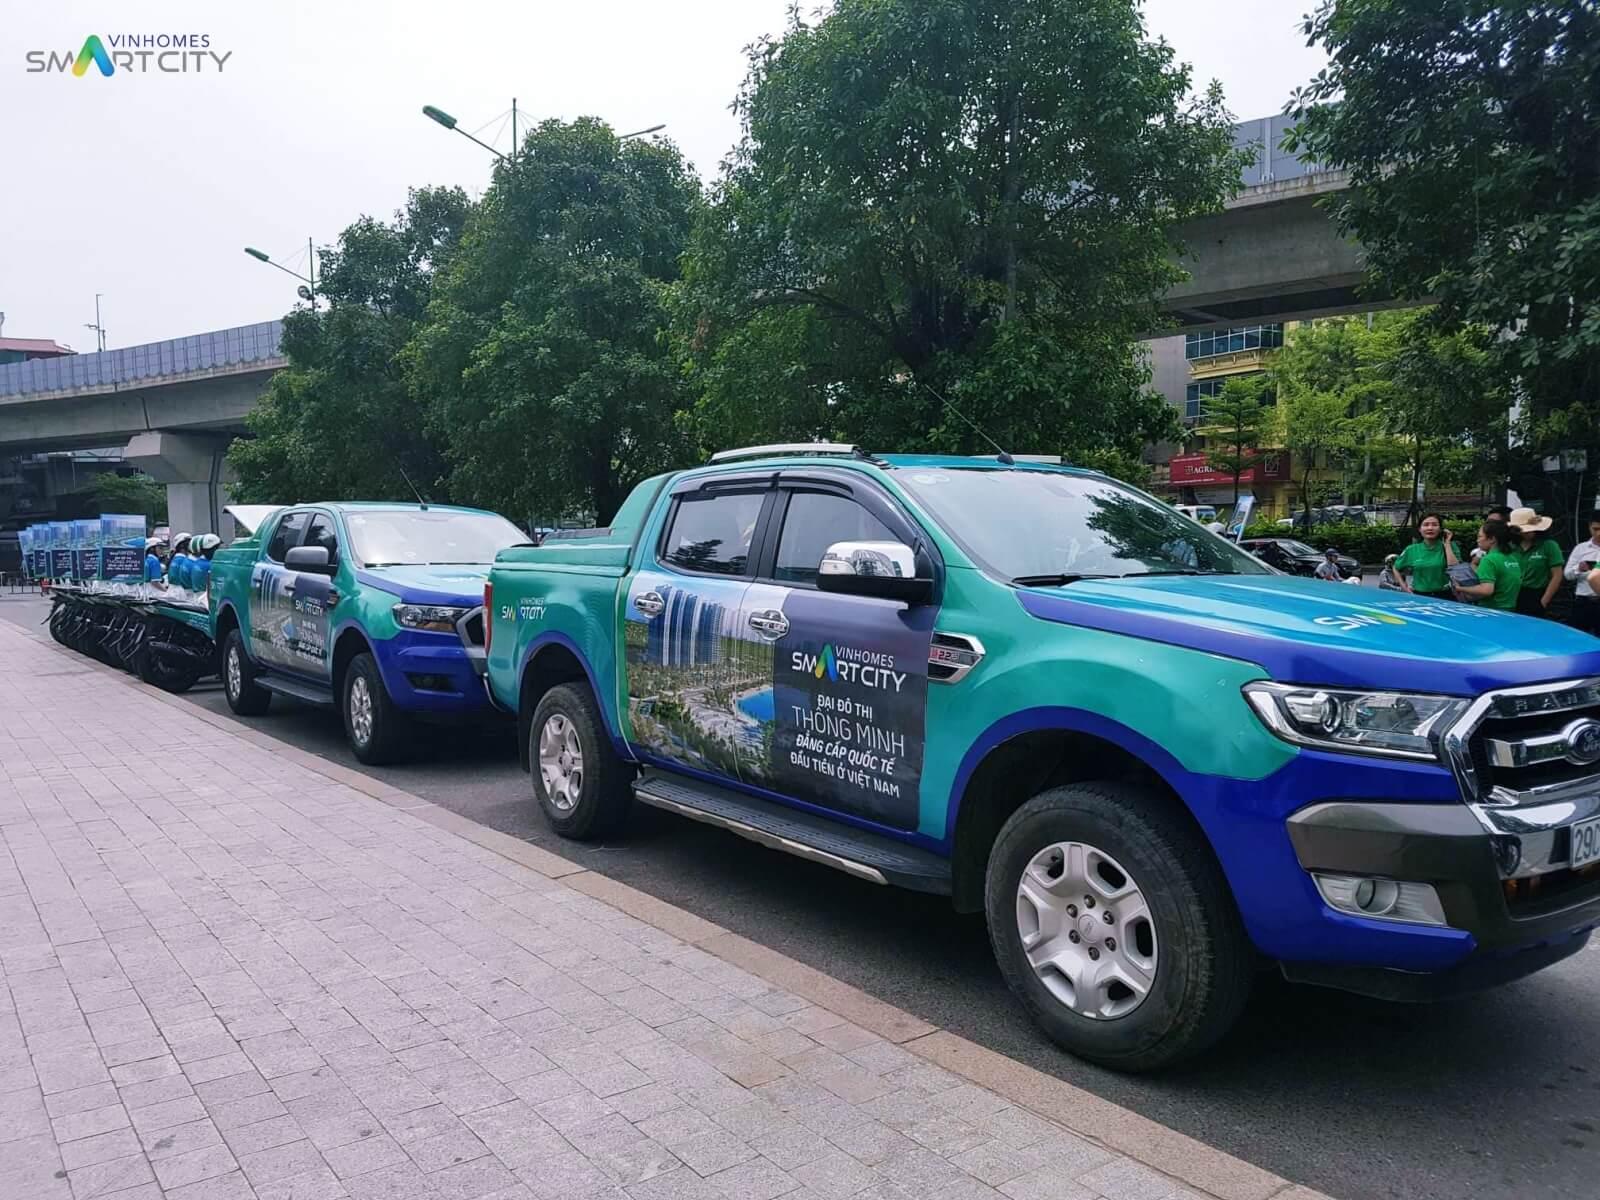 Dàn xe tham gia roadshow Vinhomes Smart City